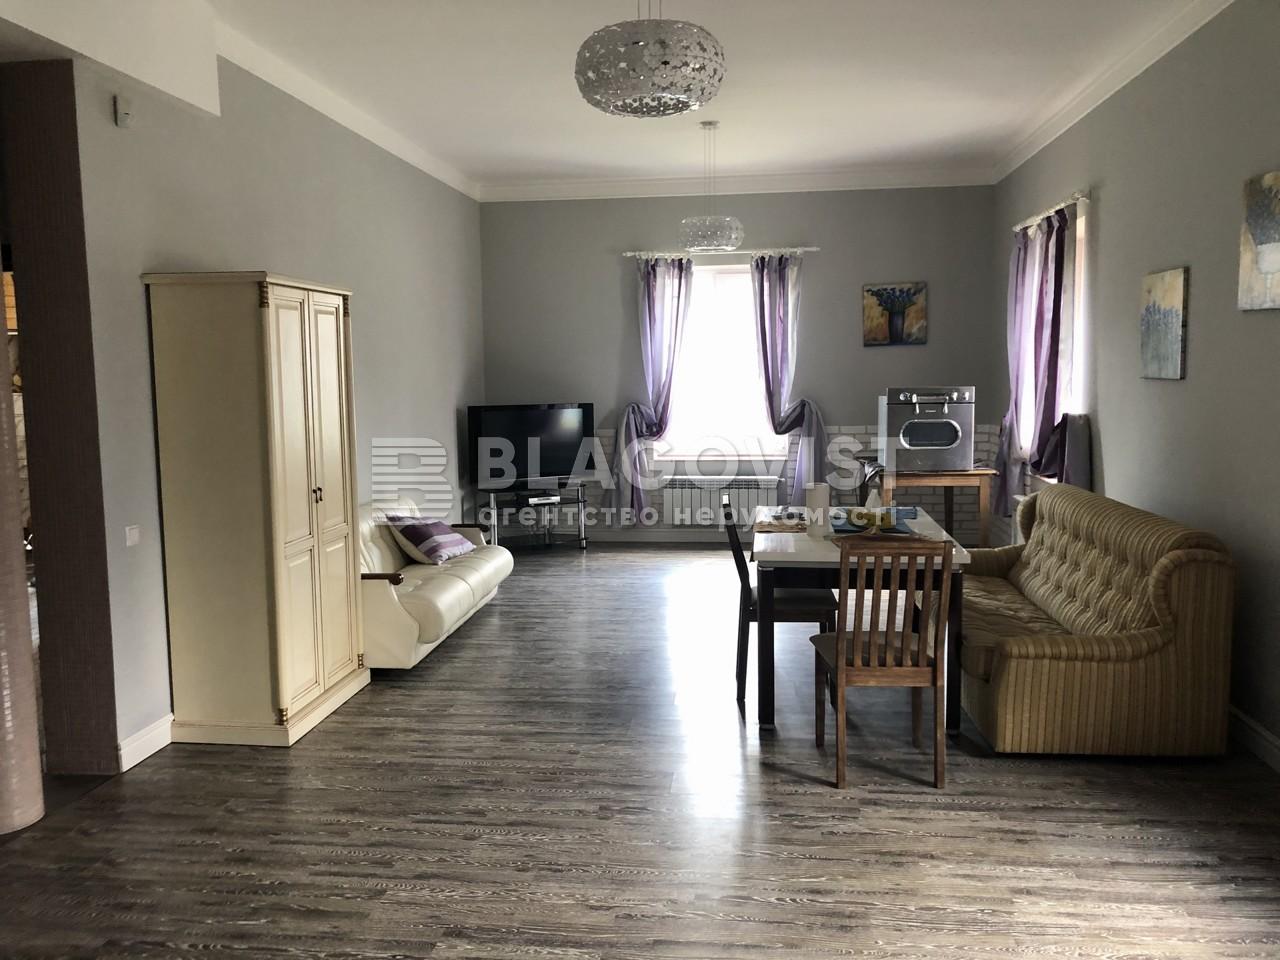 Дом F-37933, Теремская, Новоселки (Киево-Святошинский) - Фото 5